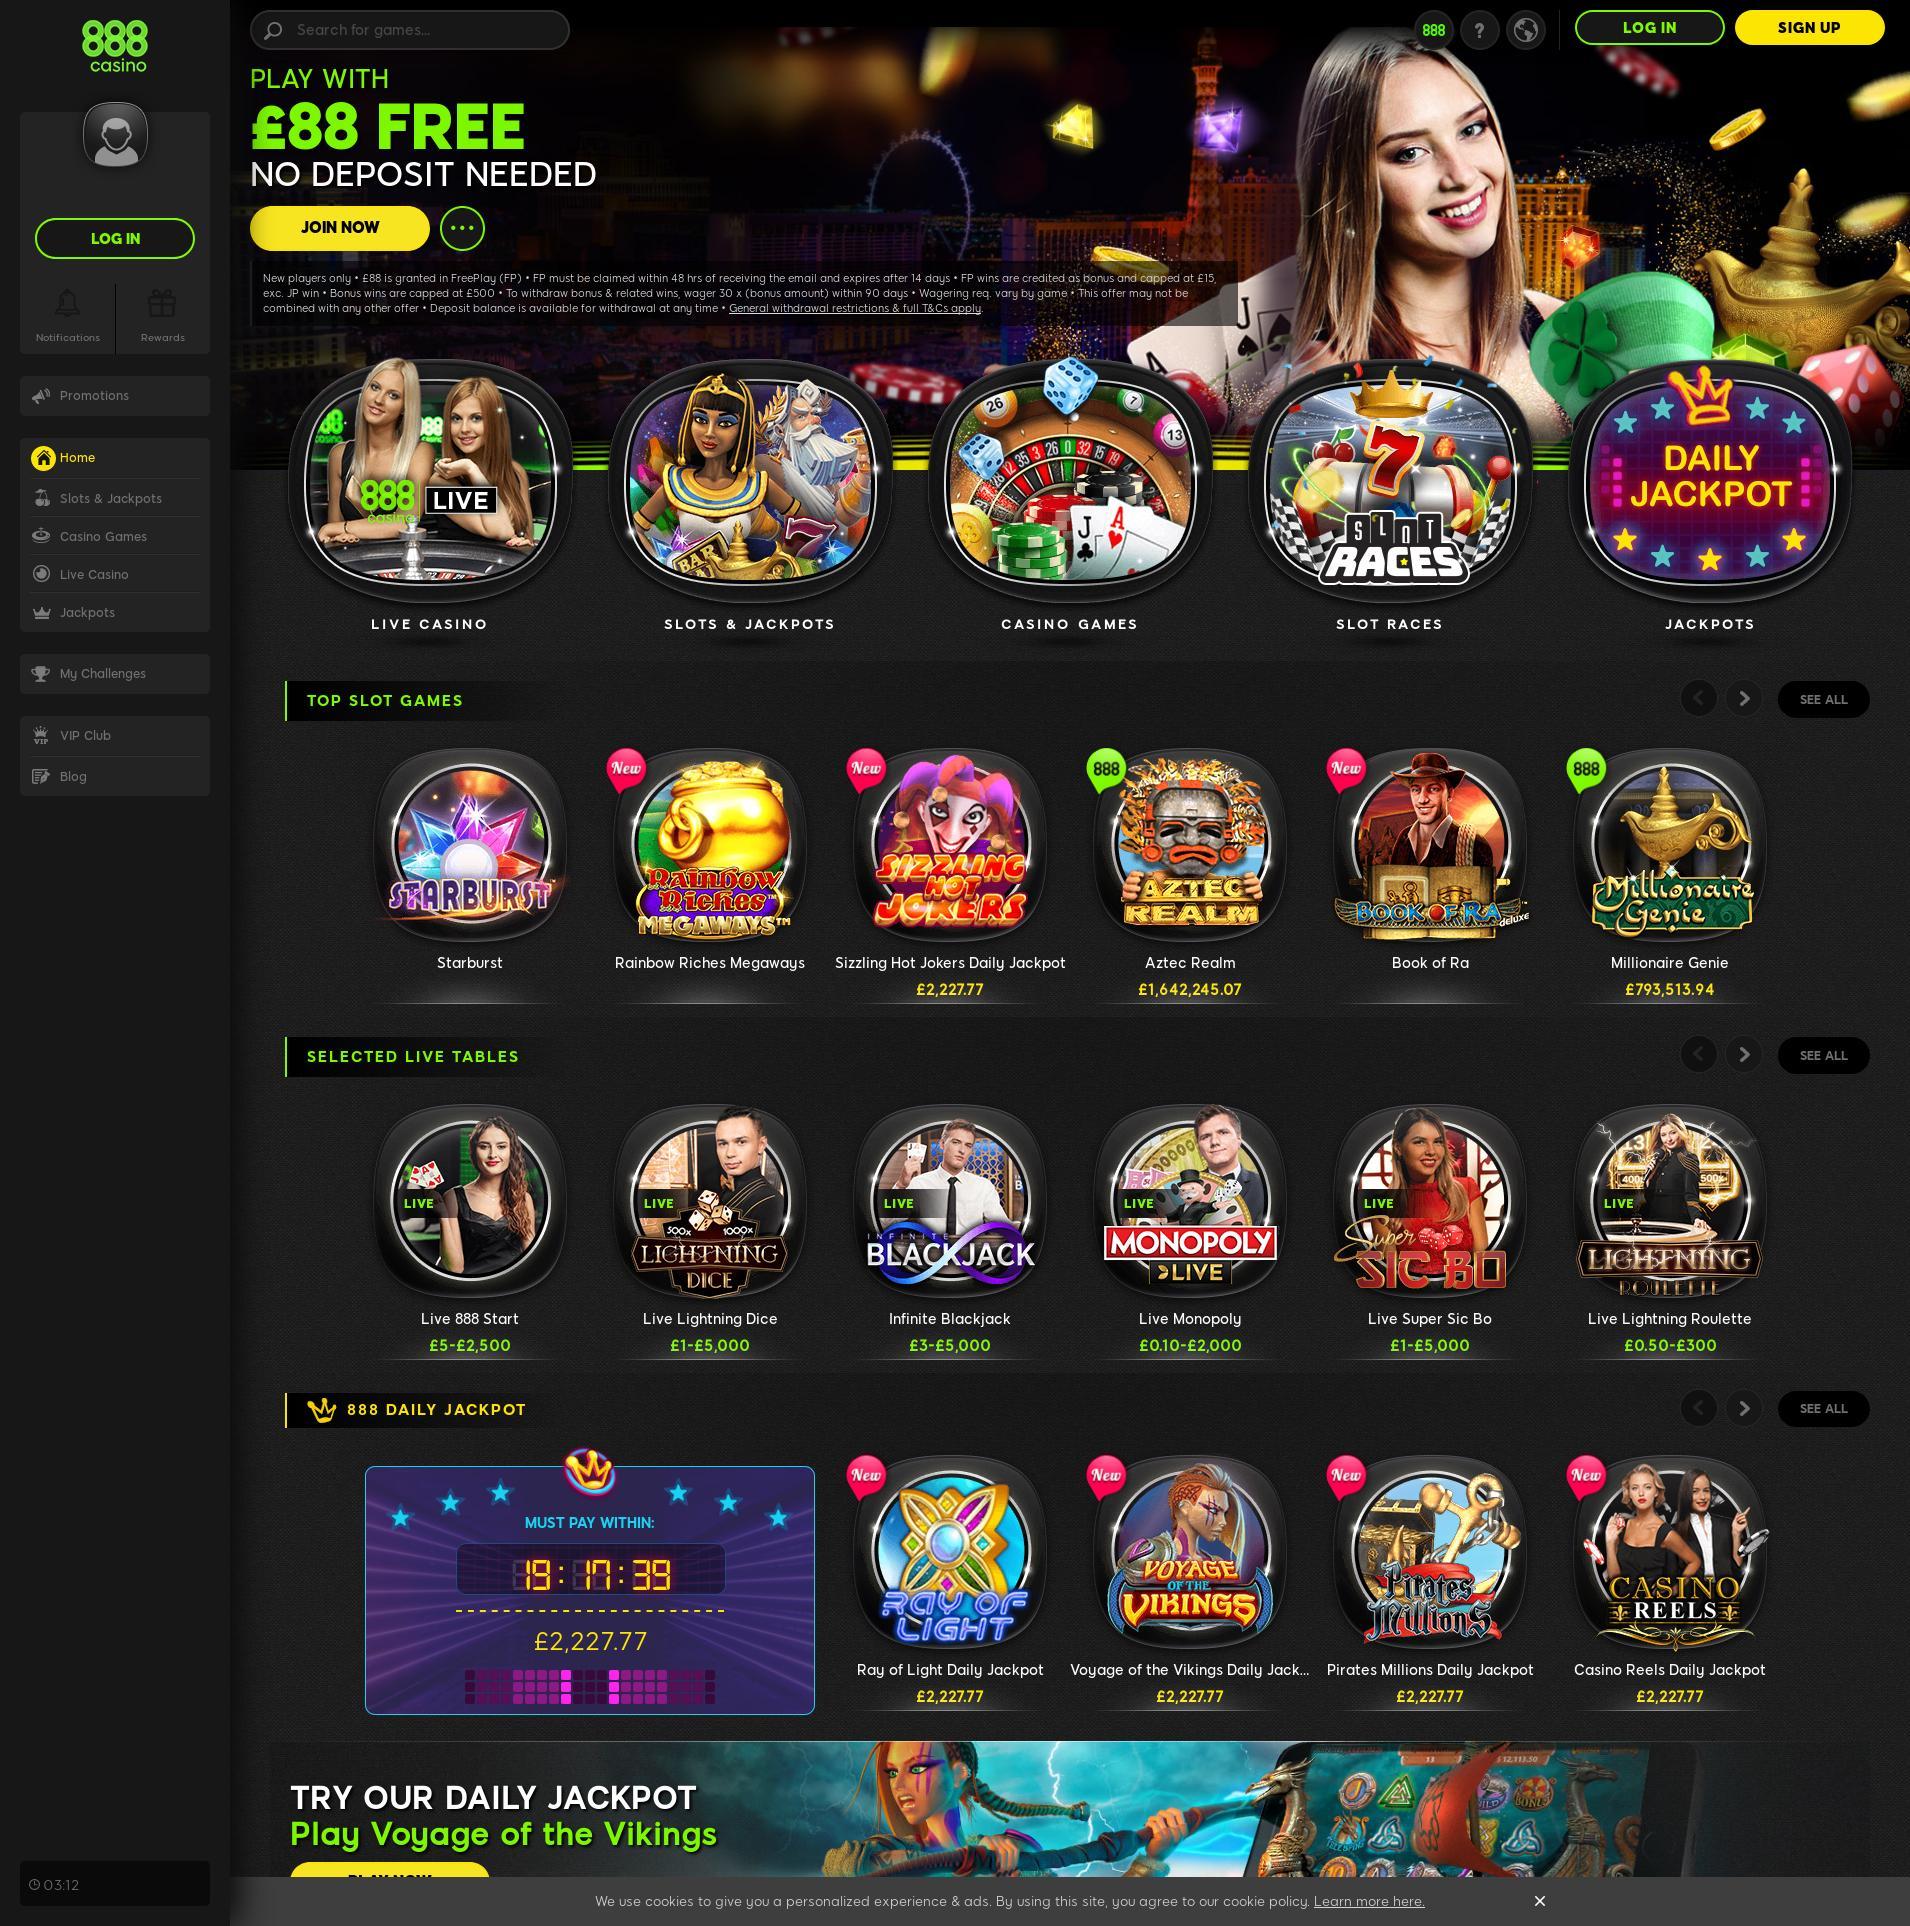 Casino screen Lobby 2019-11-20 for United Kingdom